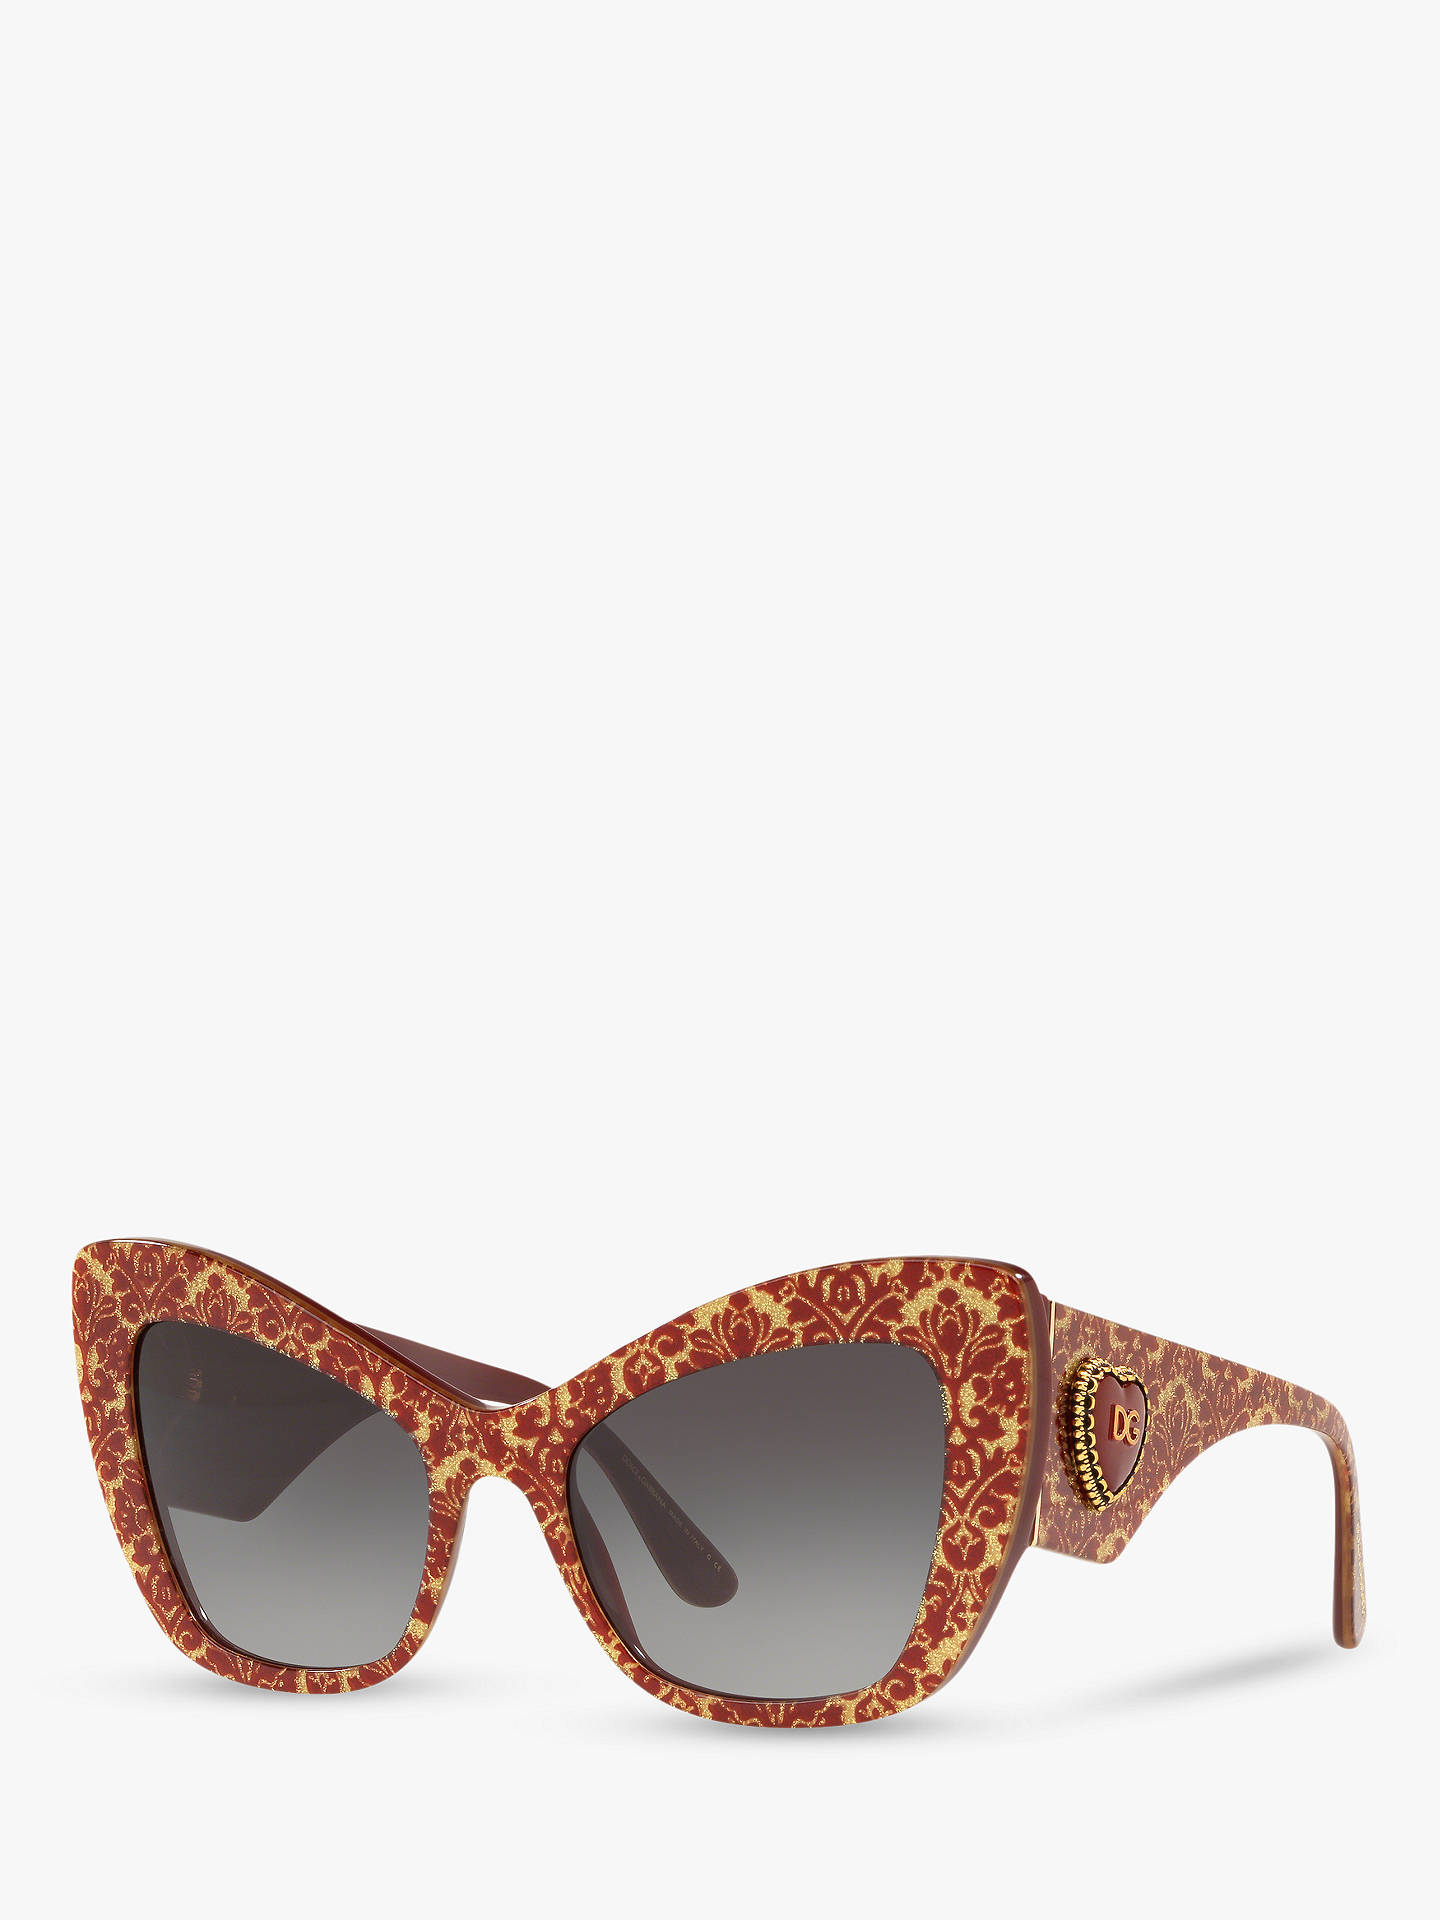 571ade190906 Buy Dolce & Gabbana DG4349 Women's Cat's Eye Sunglasses, Multi/Grey Gradient  Online at ...